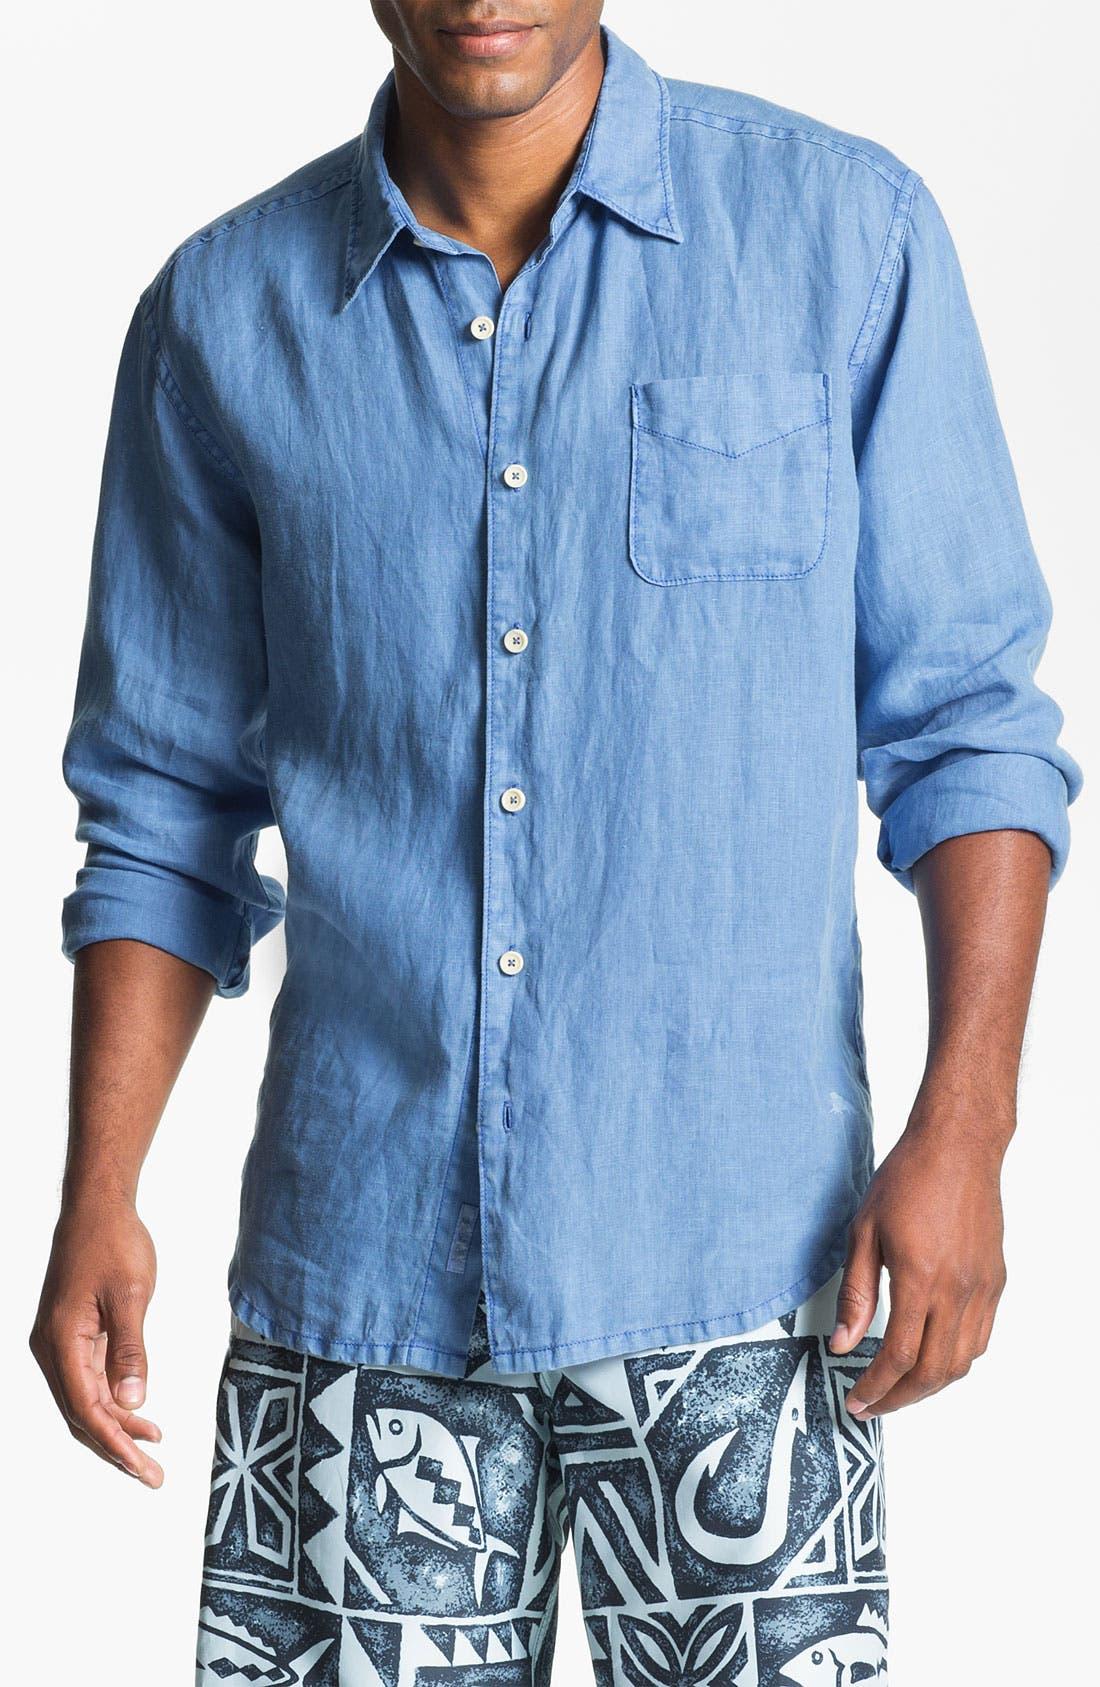 Main Image - Tommy Bahama Sport Shirt & Quiksilver Board Shorts